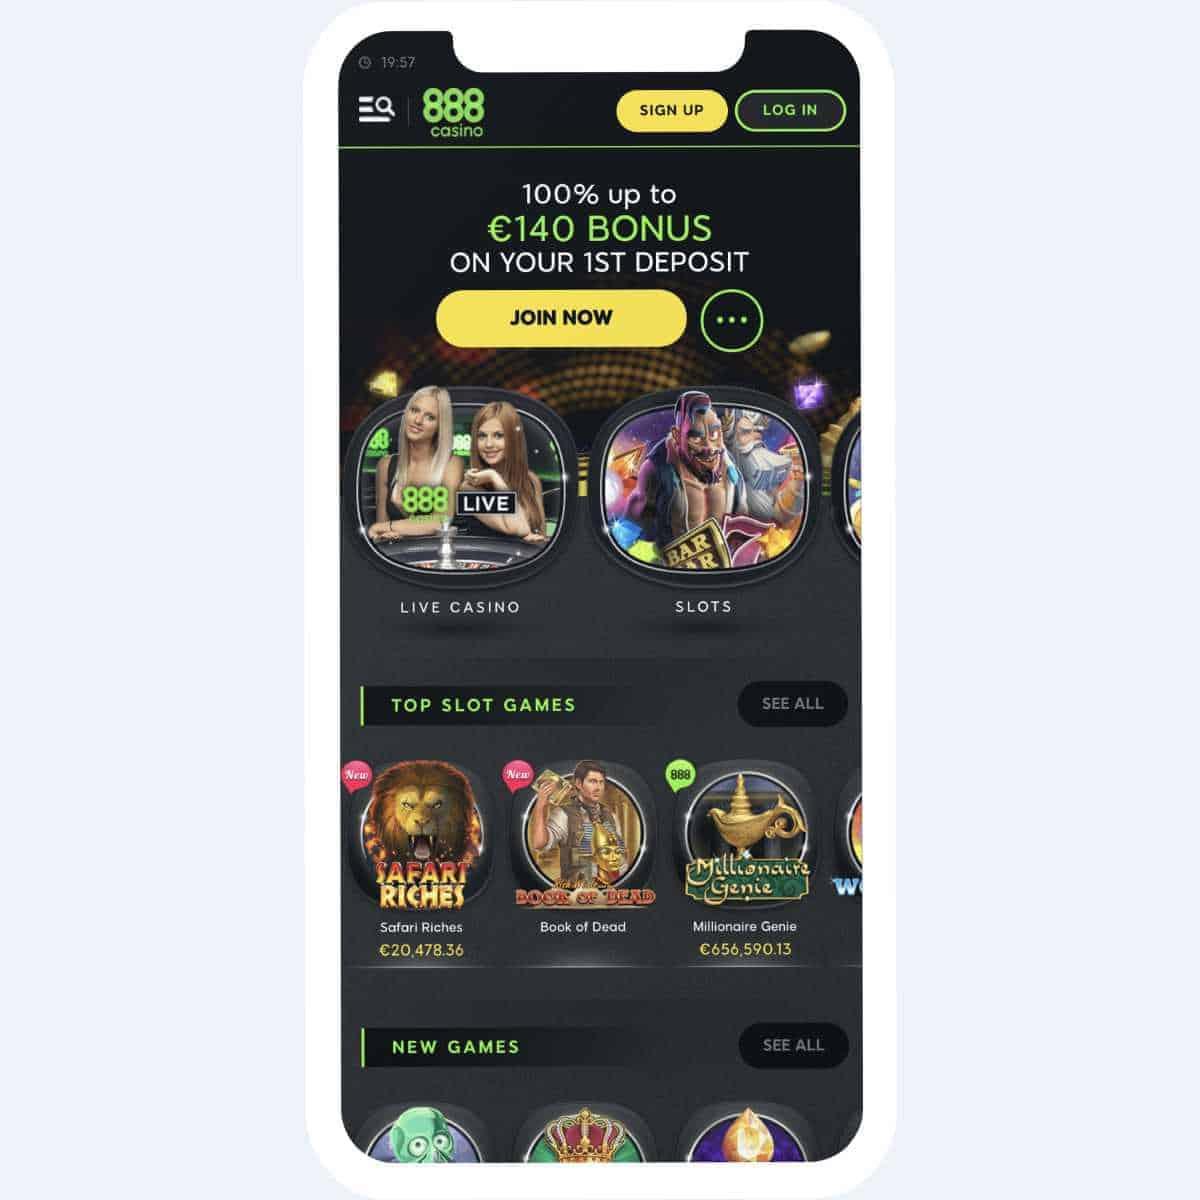 888 casino homepage mobile